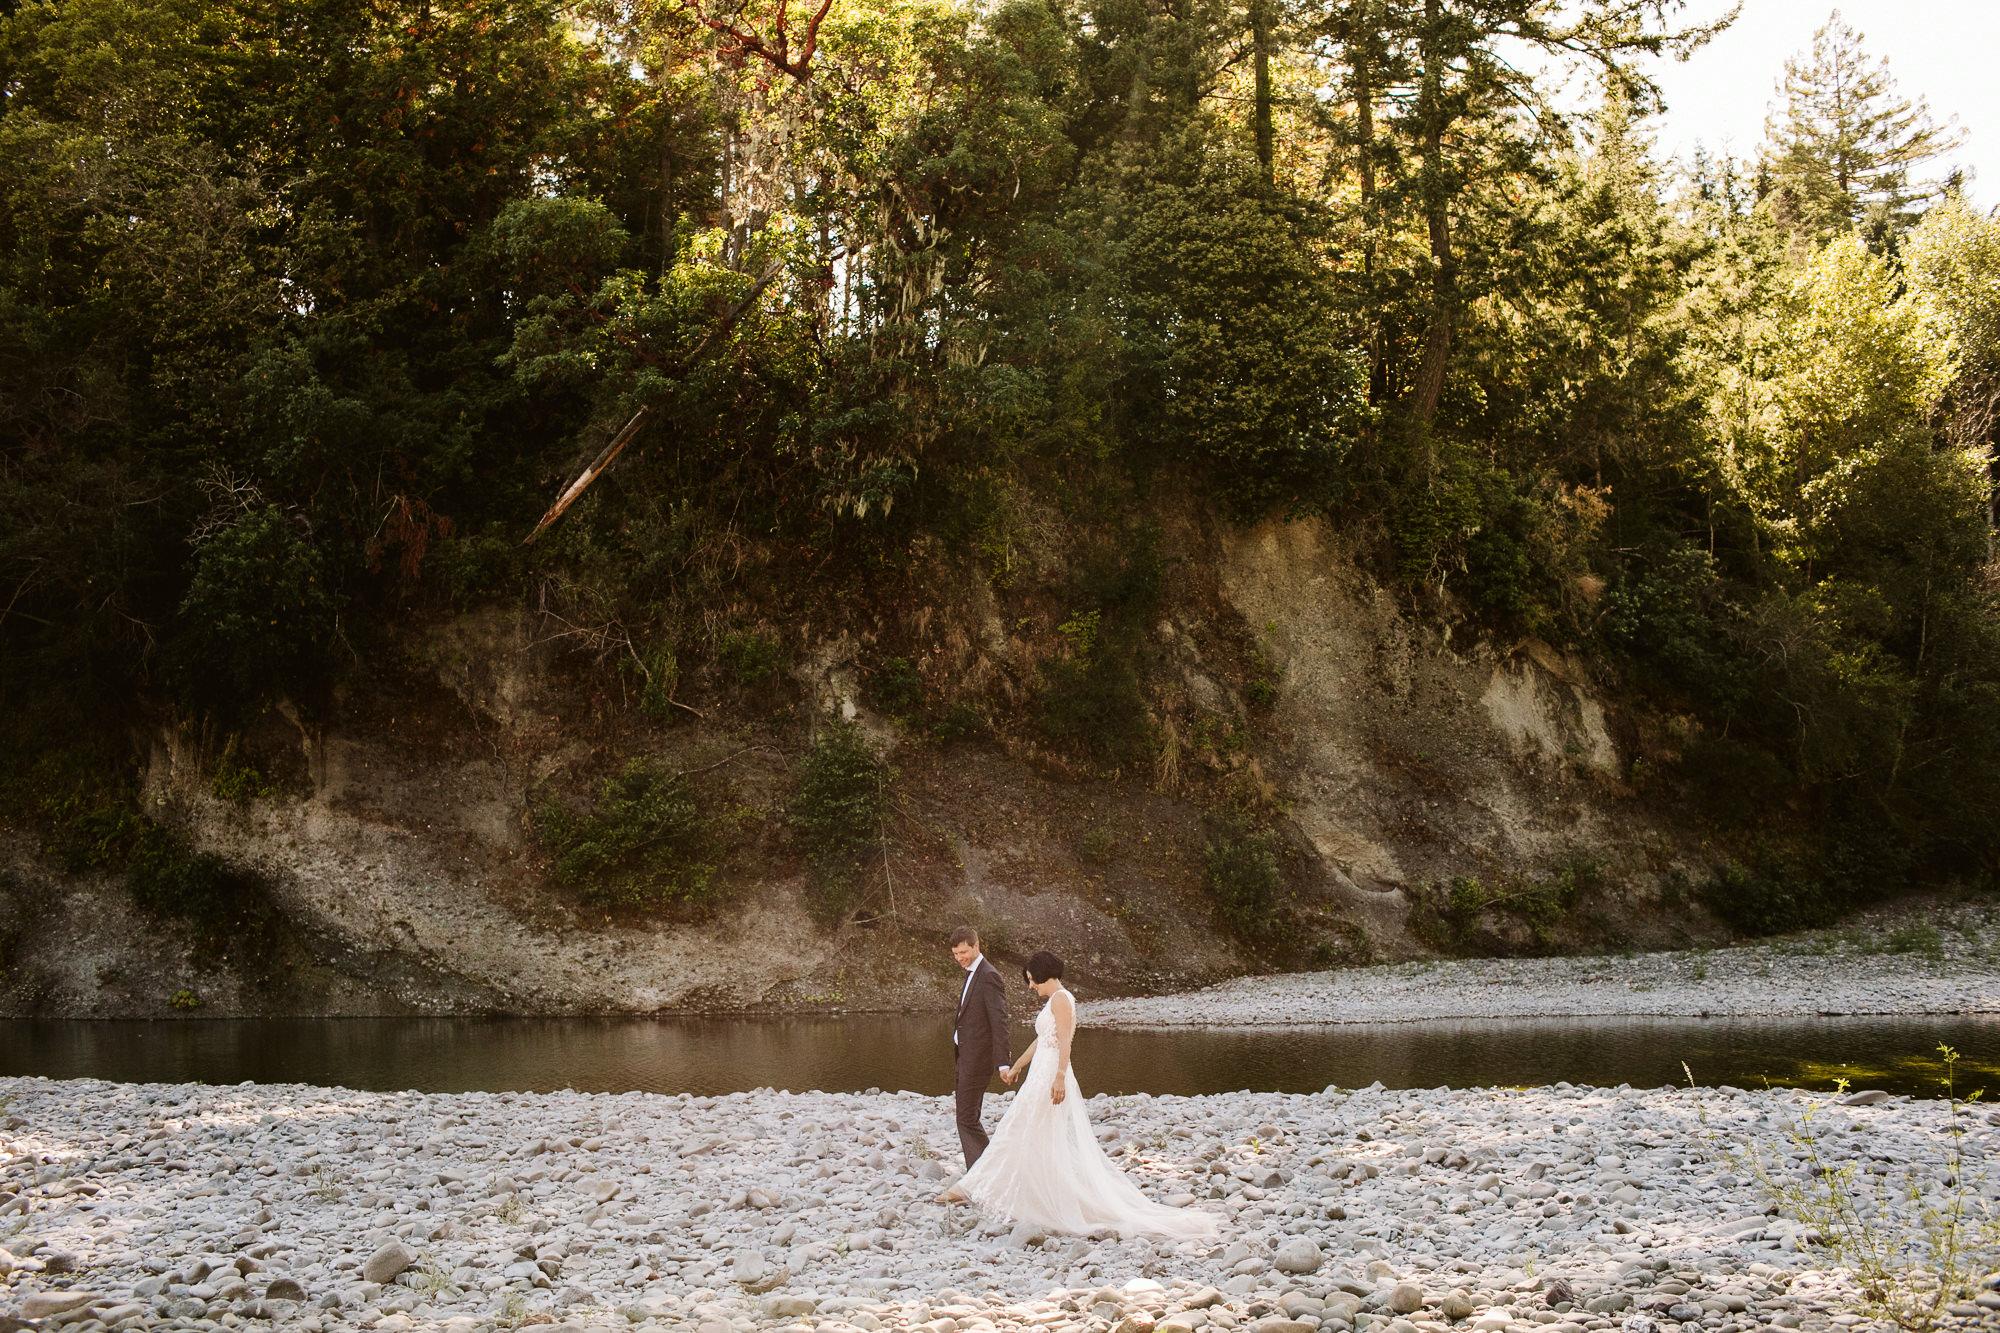 California-wedding-photographer-alfonso-flores-pamplin-groove-263.jpg